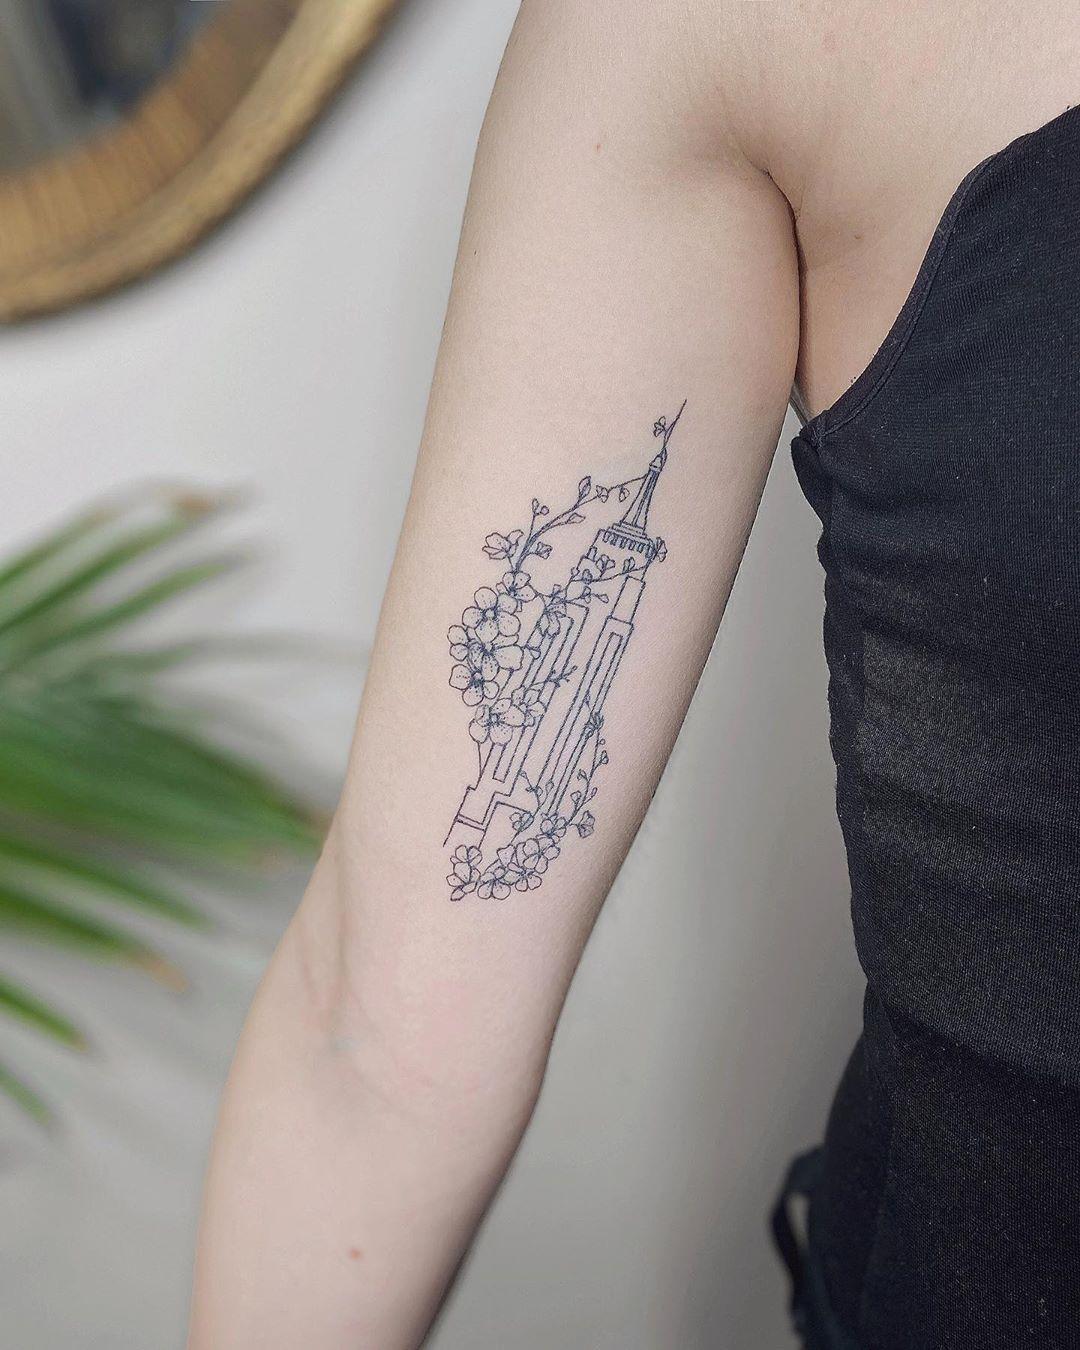 New York I love you! 🤍🗽 1 year healed Empire State for Dominique . . . . #flowerstattoo #empirestate #wildflowertattoo #darkartists #blacktattooart #tattoodo #radtattoos #tattoo2me #btattooing #skinartmag #inkjunkeyz #thebesttattooartists #TAOT #tattooideas #brooklyn #onlyblackart #tattrx #flowerbouquet #empirestatebuilding #tattoooftheday #loveflowers #cherryblossom #flowertattoo #flowerlove #cherryblossoms #fleurnoiretattoo